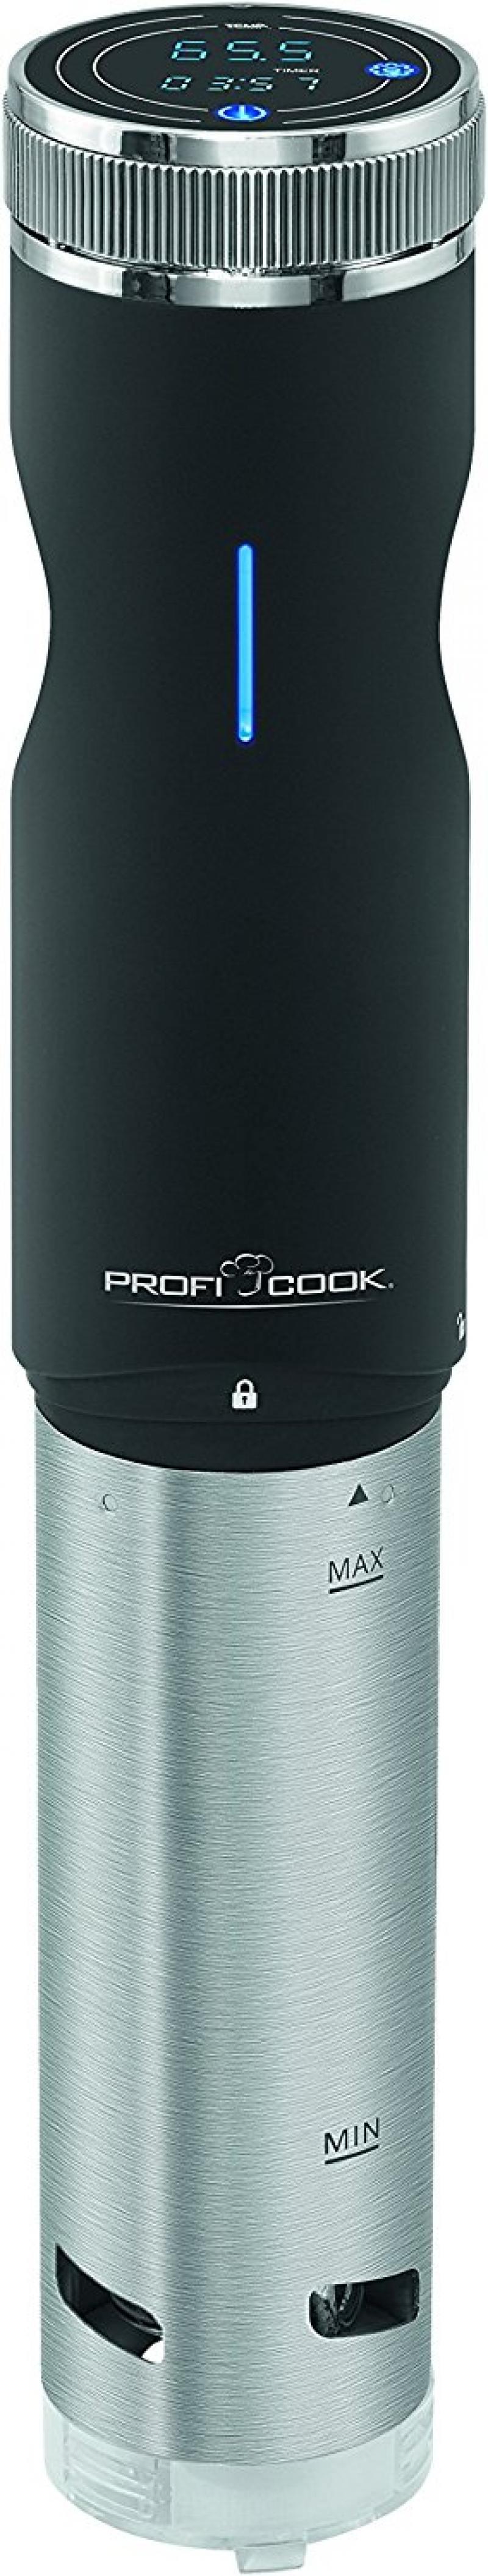 Су вид Profi Cook PC-SV 1126 profi cook pc sv 1126 мультиварка су вид